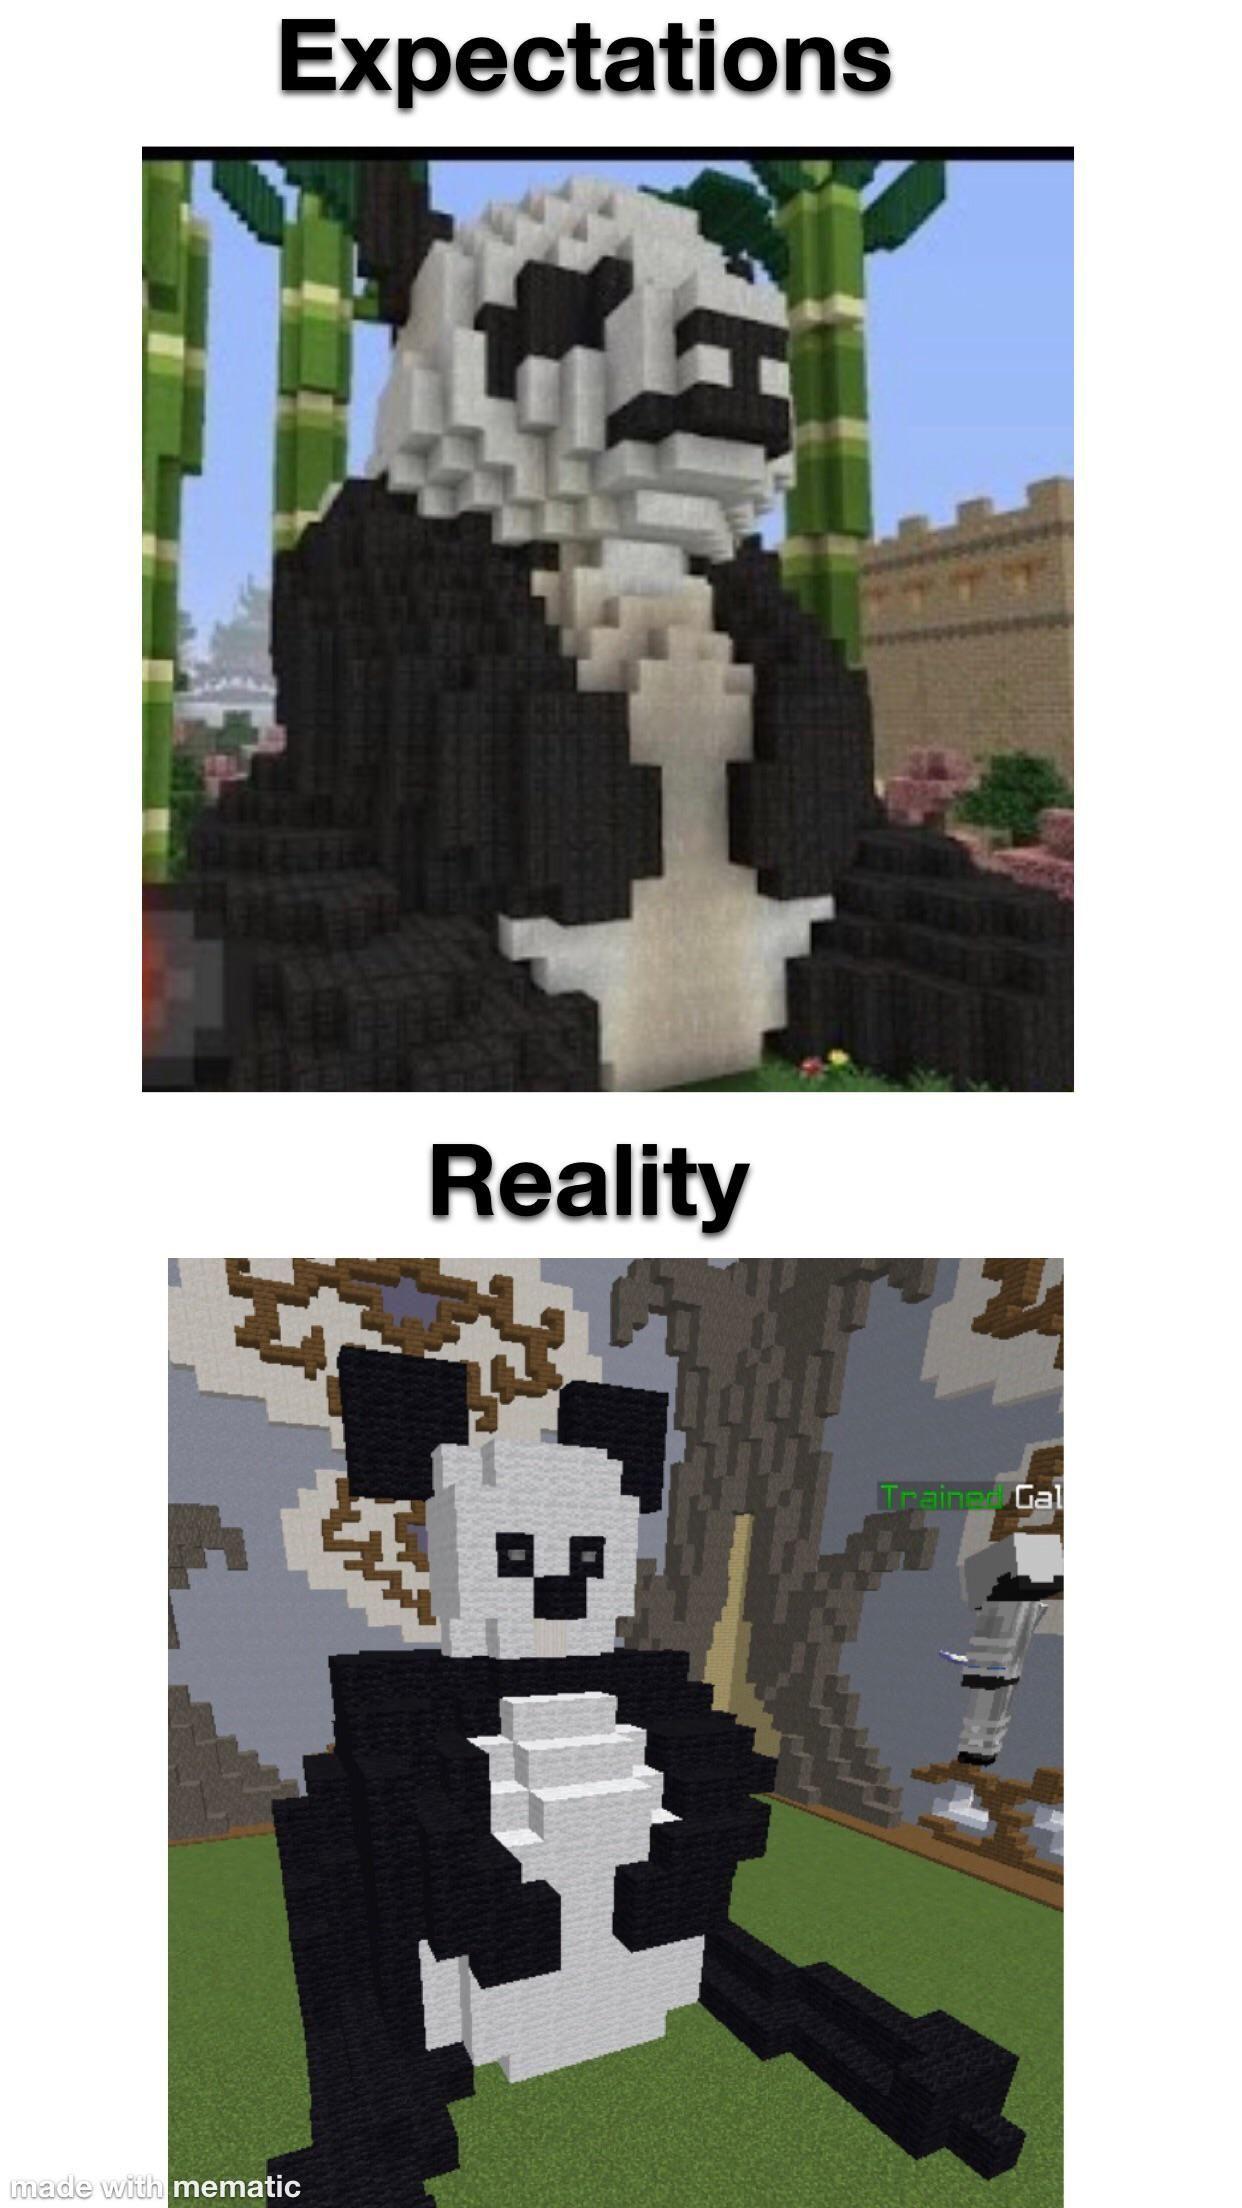 Pin By Minecraft Hytale Builds Mem On Minecraft Reddit Memes Minecraft Creations Minecraft Memes Reddit Memes